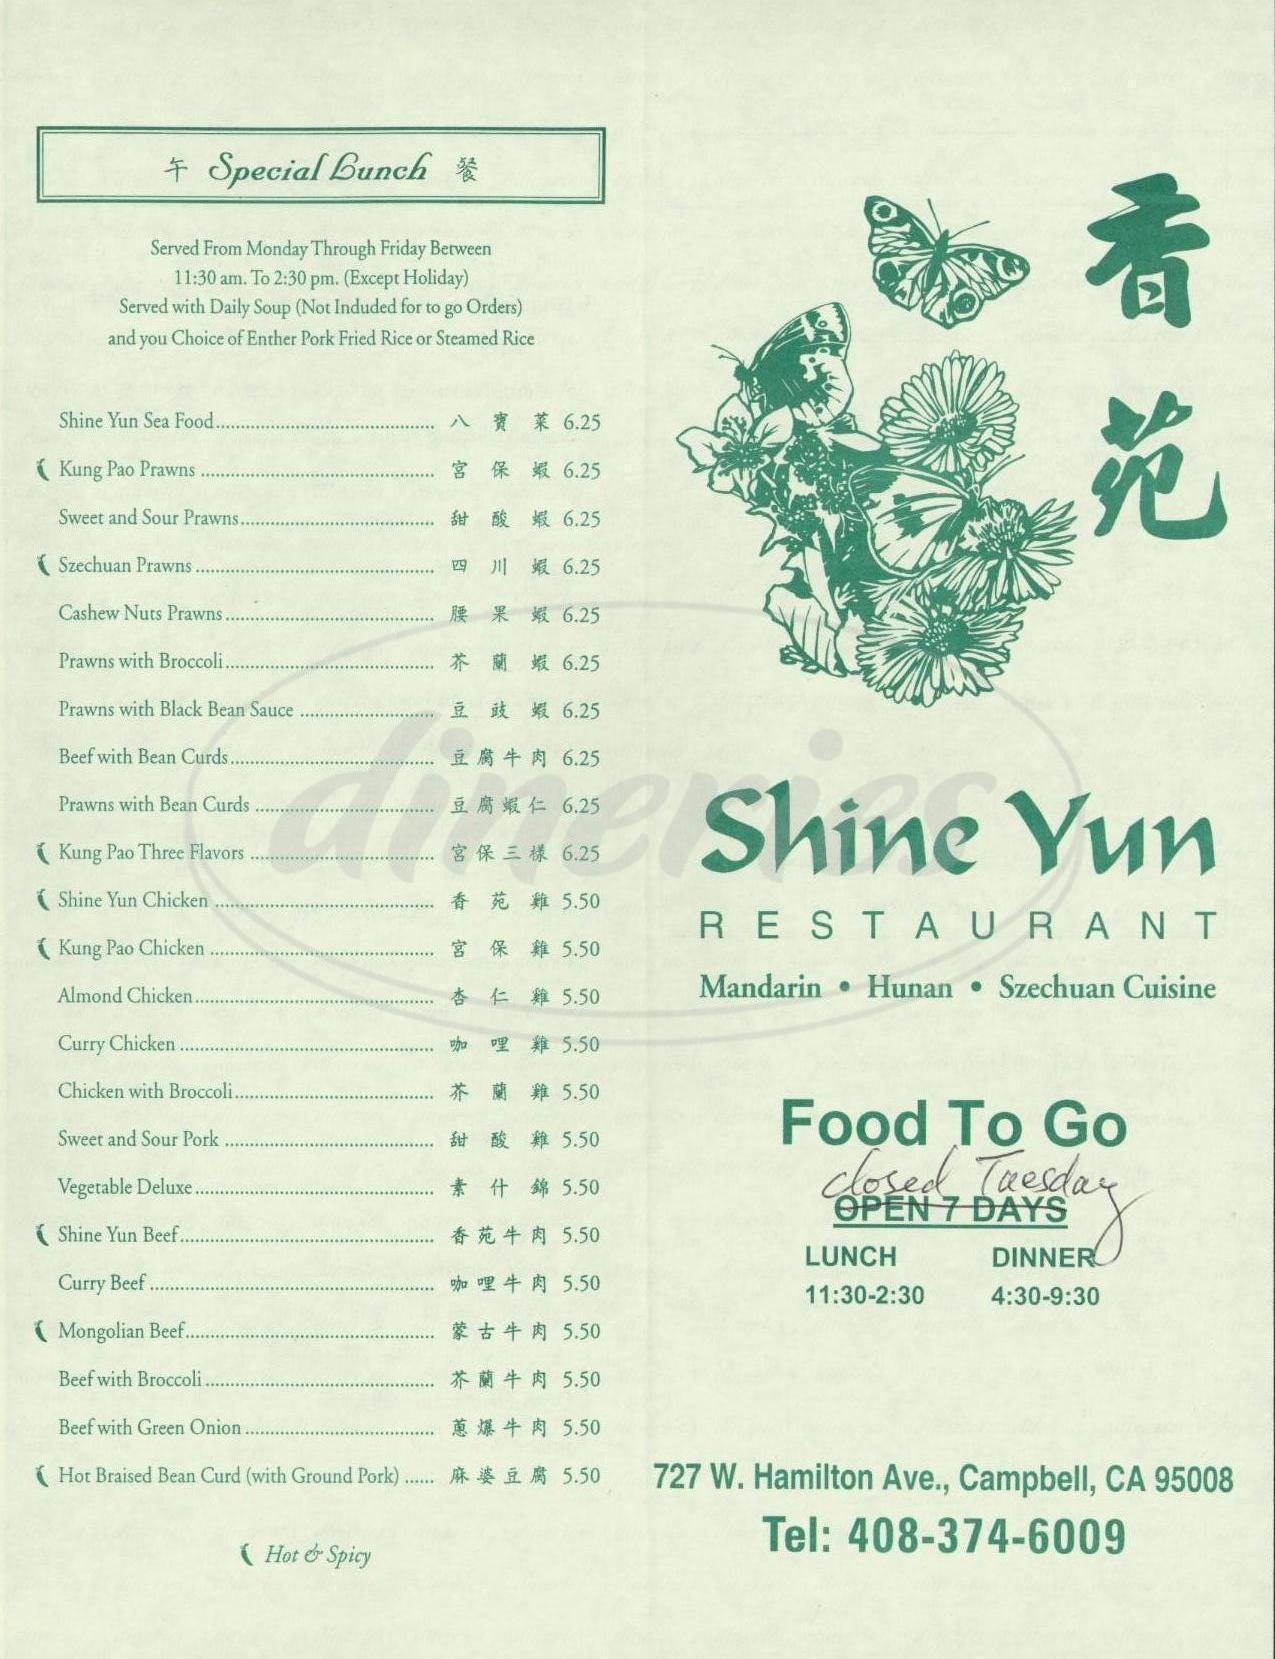 menu for Shine Yun Restaurant